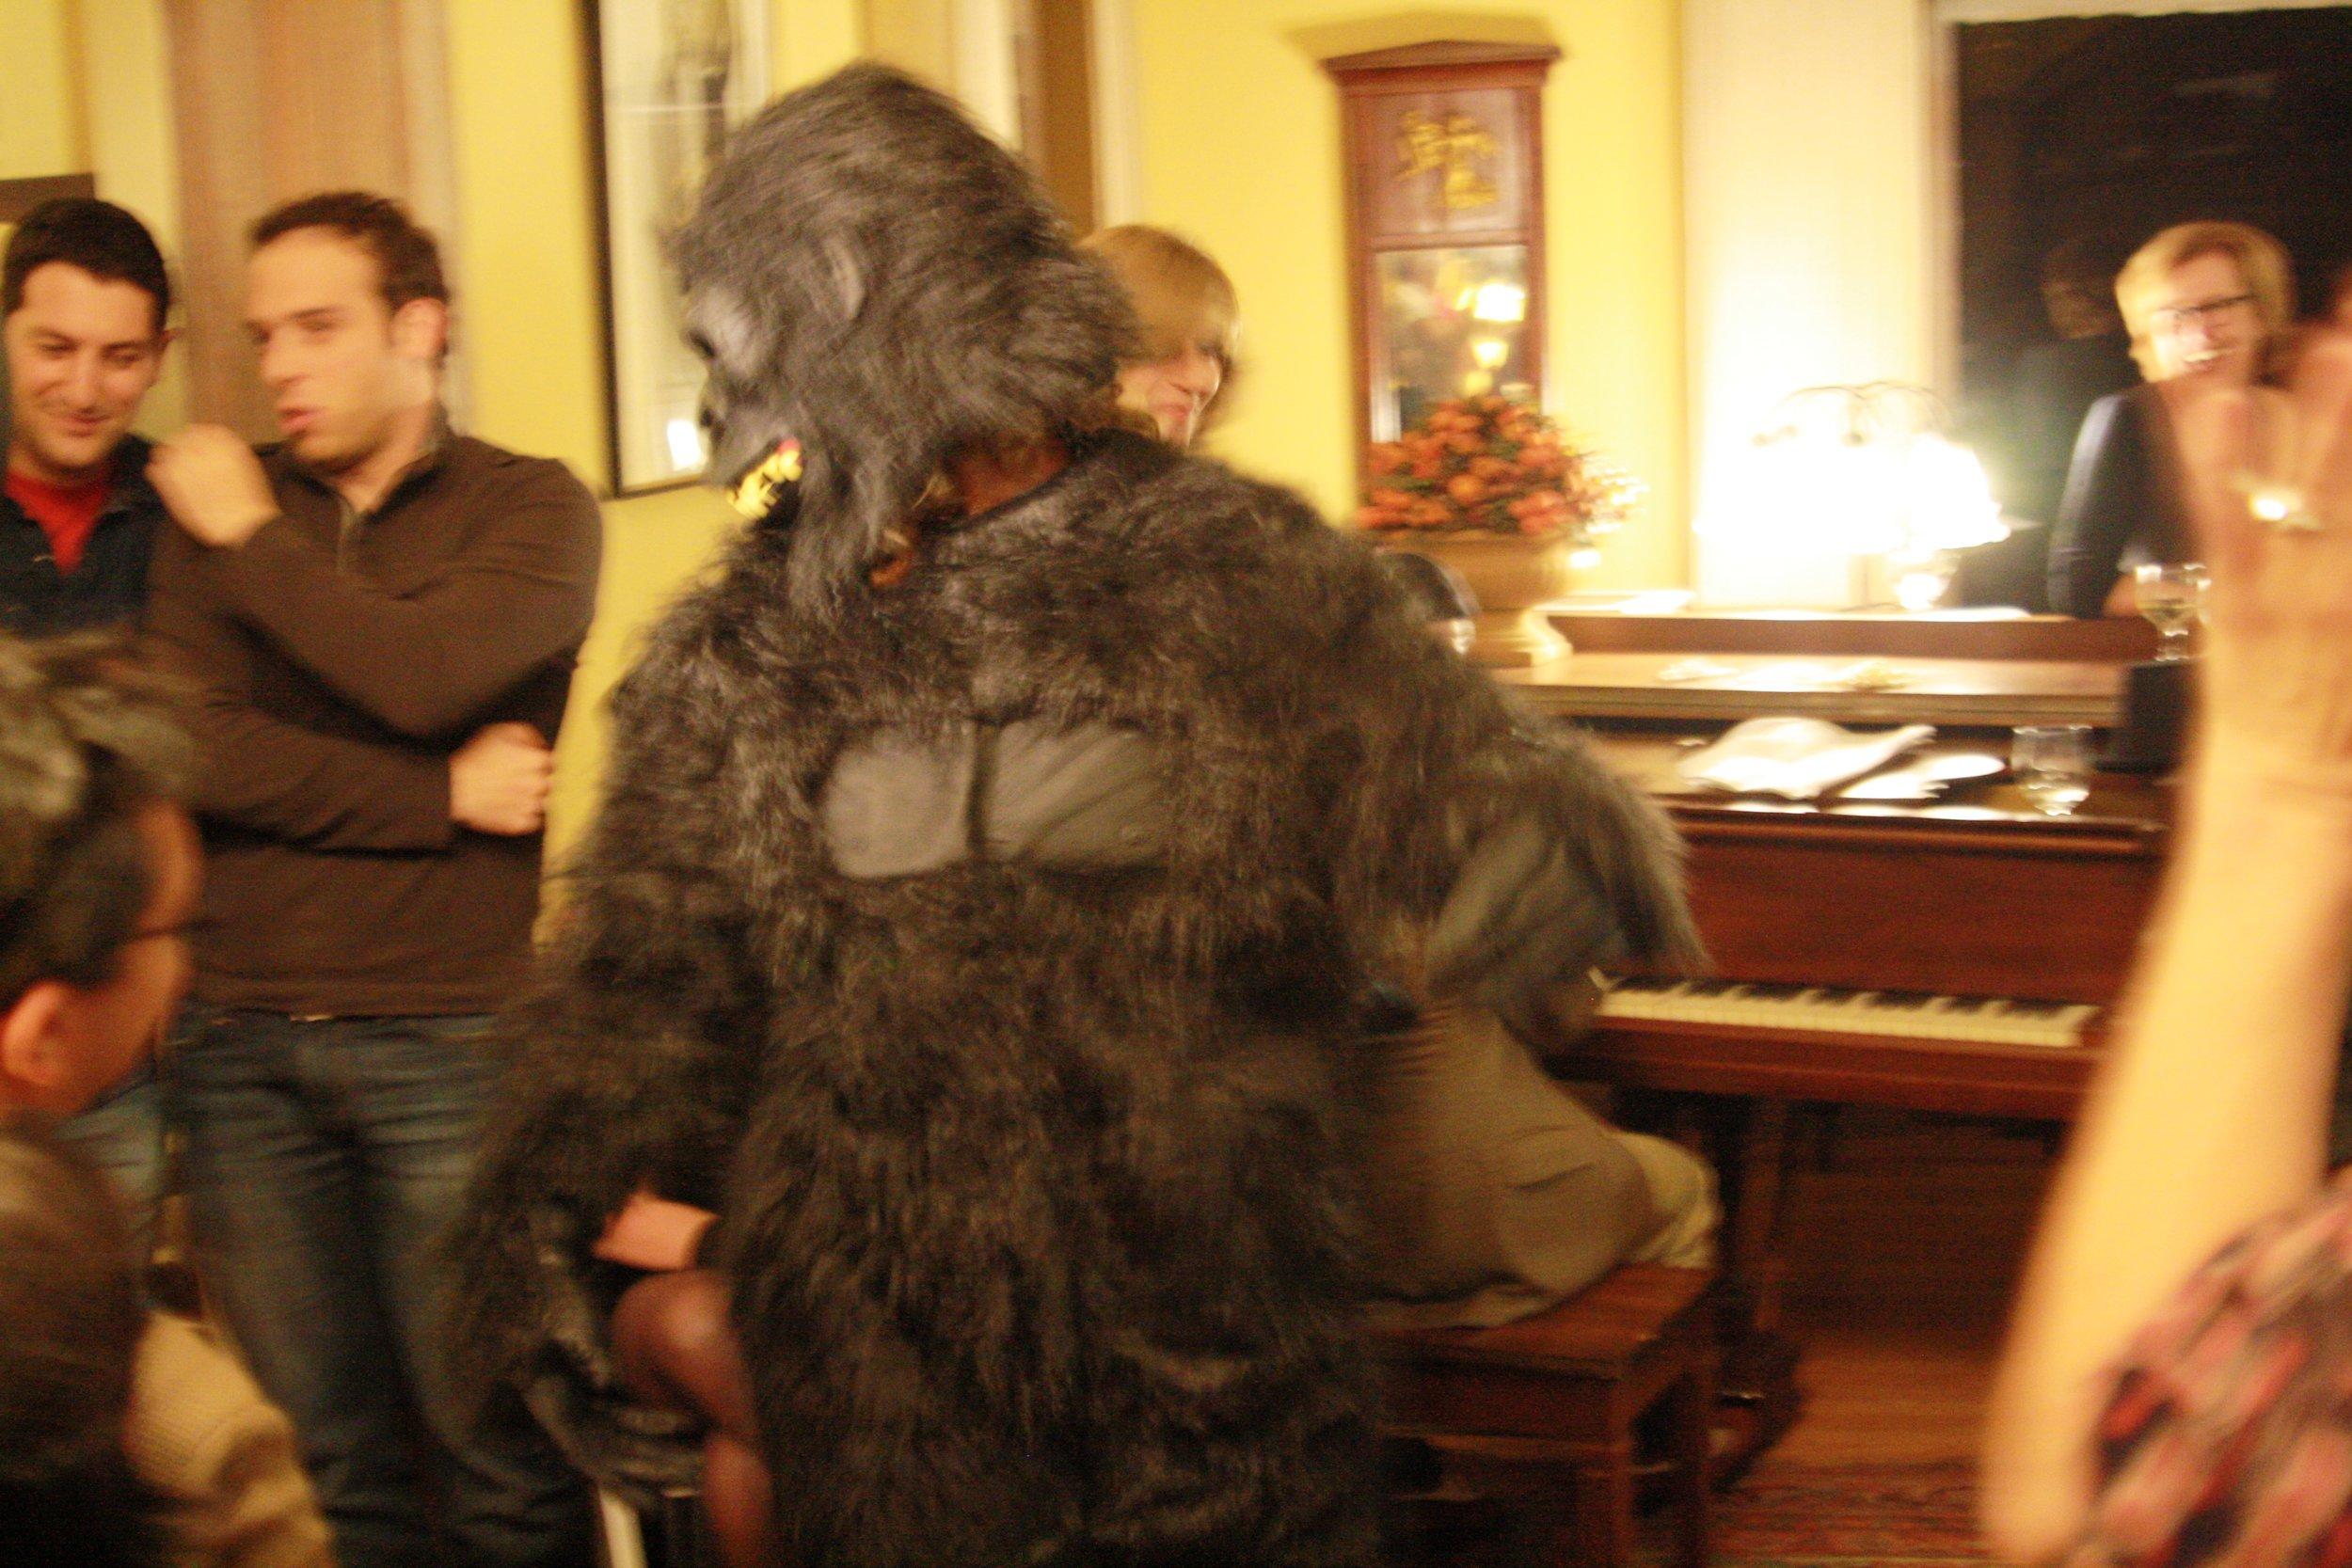 Then In Comes a Gorilla!.jpg